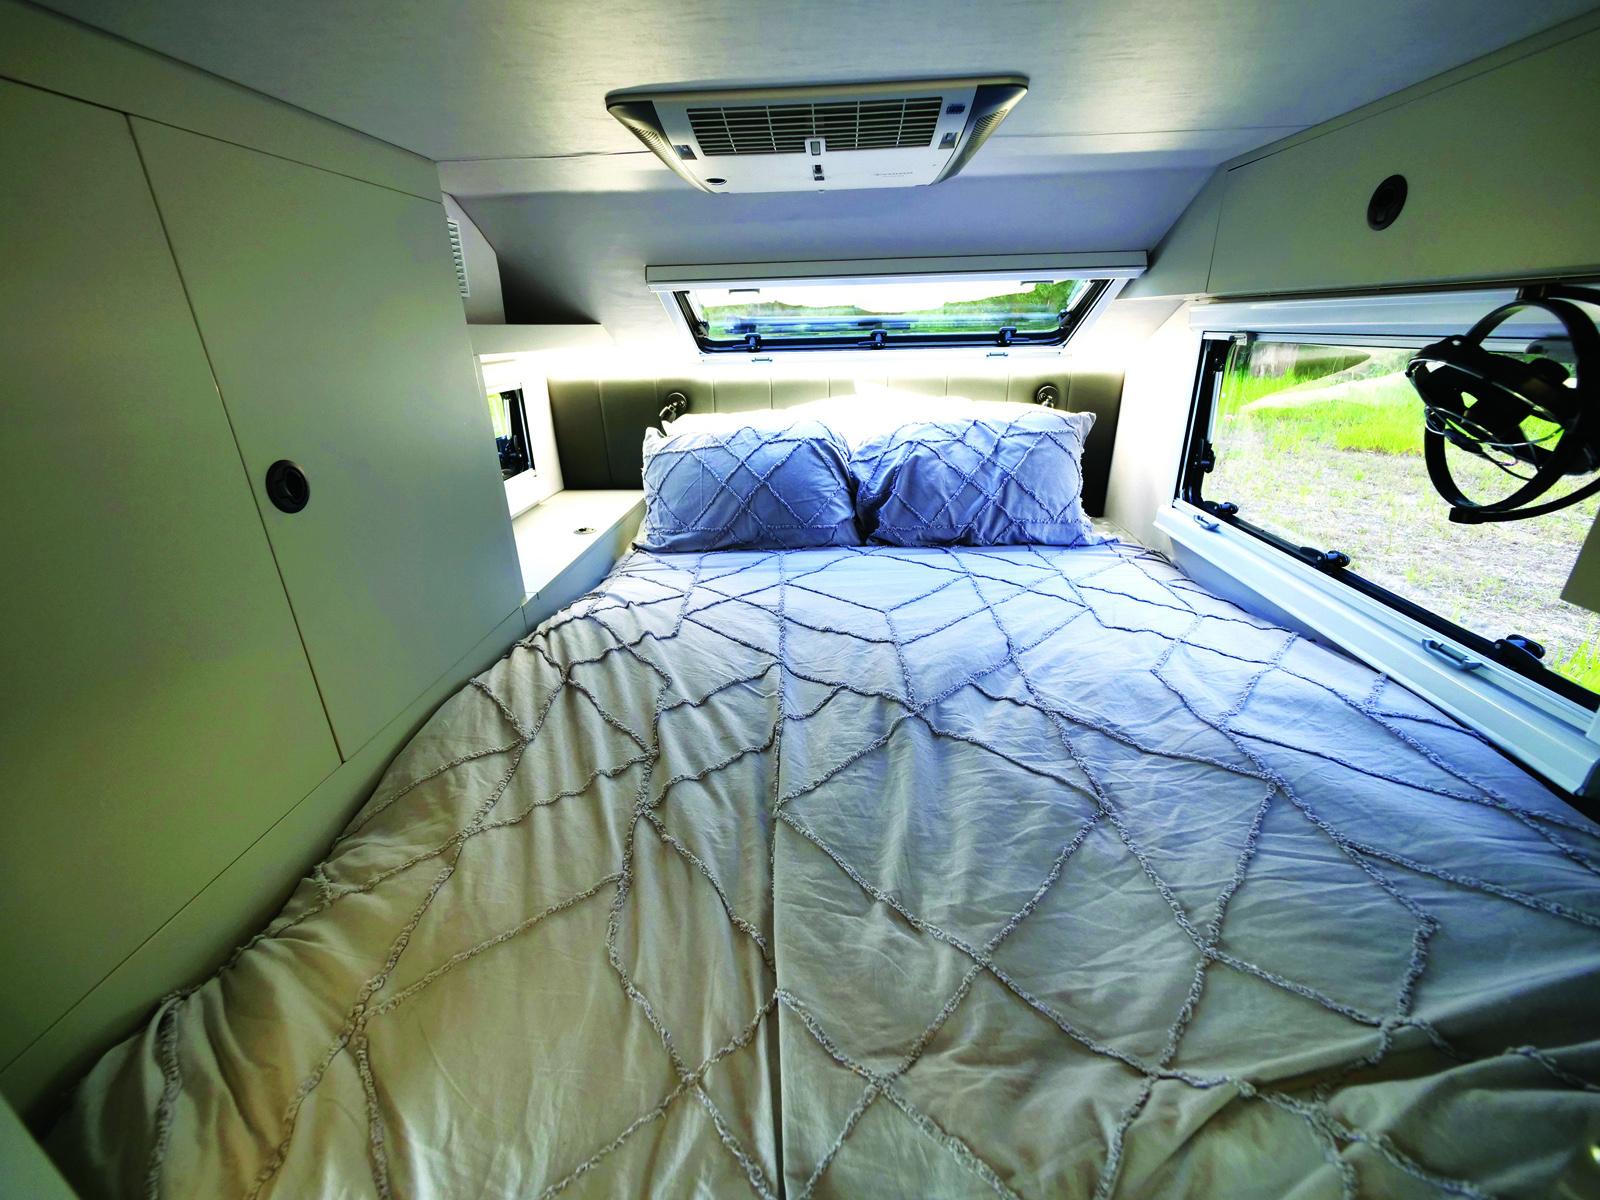 Bruder EXP-6 caravan interior